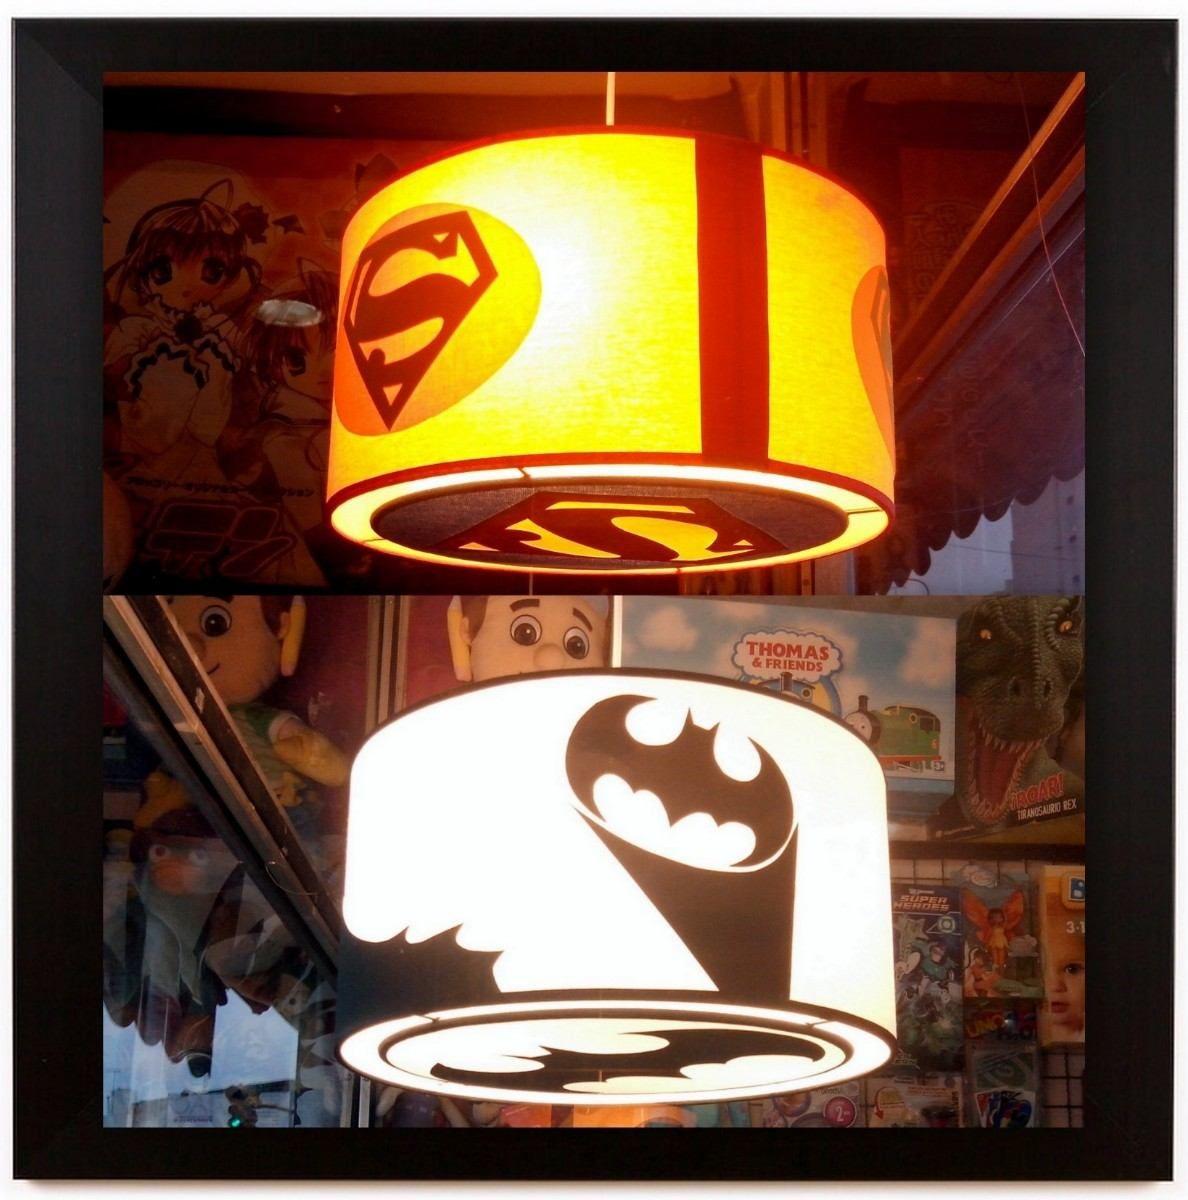 Lamparas Colgantes Superheroes Batman Superman Spiderman 589 00 Lamparas Colgantes Lamparas Batman